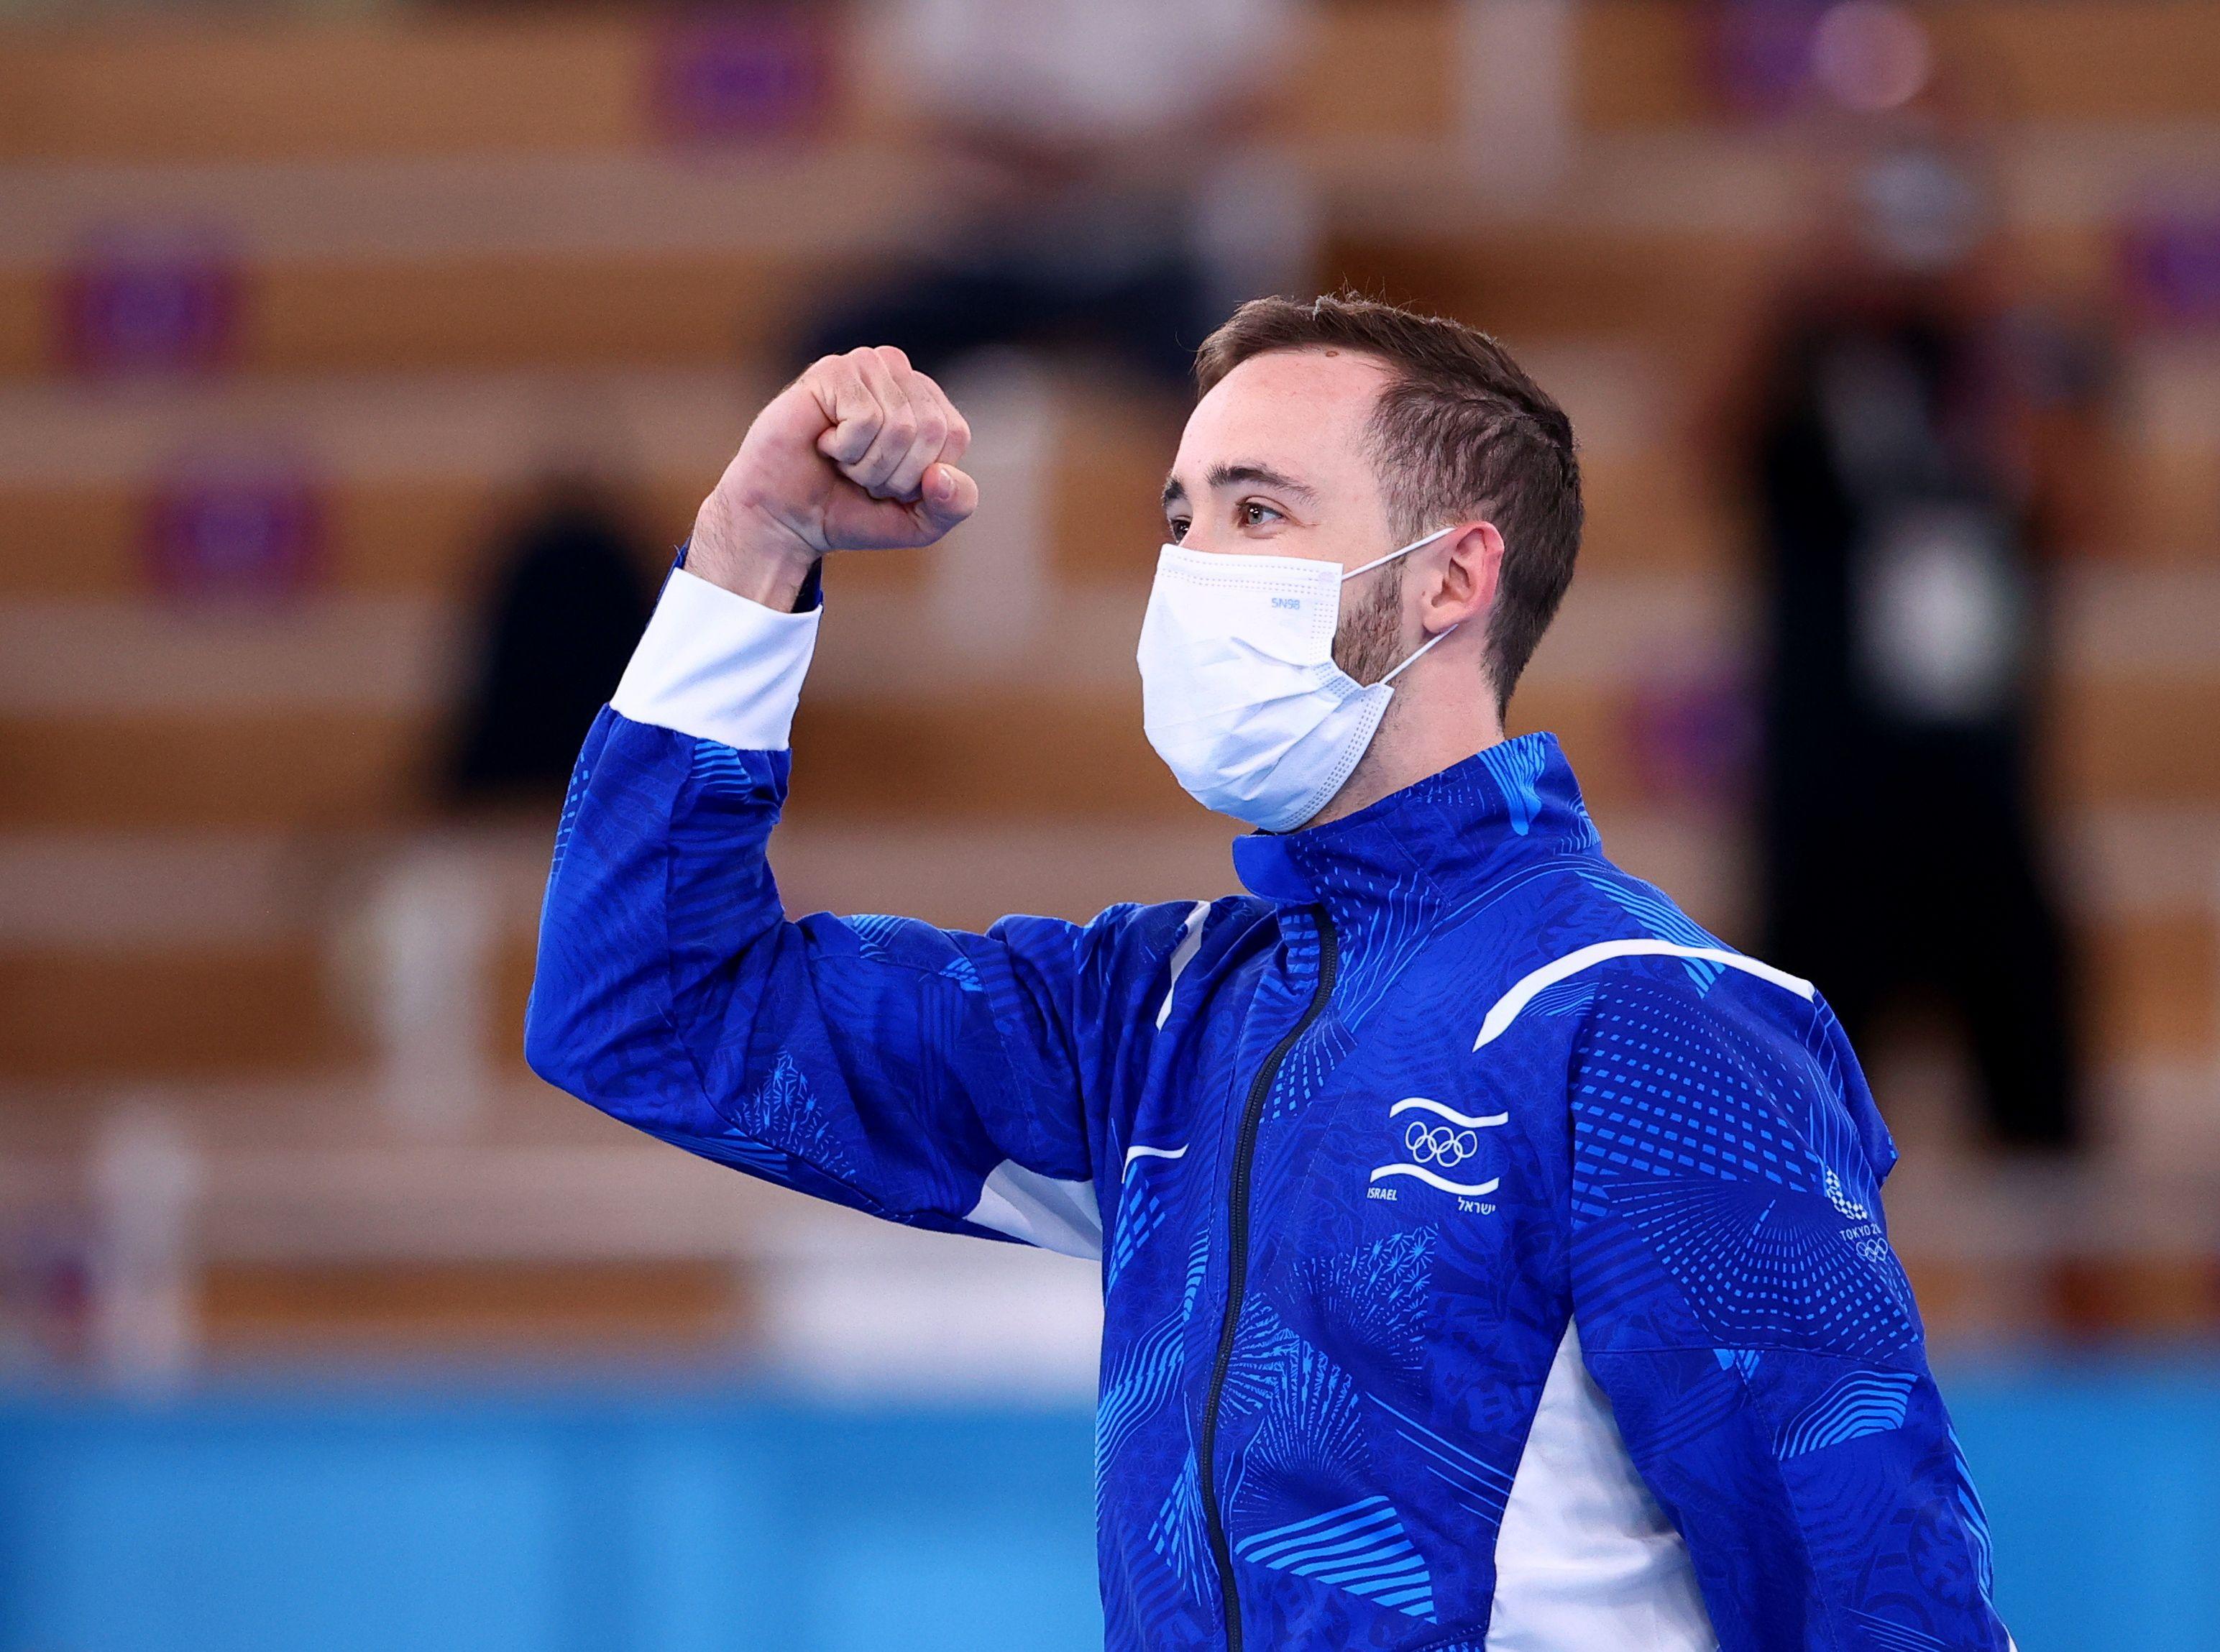 Tokyo 2020 Olympics - Gymnastics - Artistic - Men's Floor Exercise - Medal Ceremony - Ariake Gymnastics Centre, Tokyo, Japan - August 1, 2021.  Gold medallist Artem Dolgopyat of Israel wearing a protective face mask reacts. REUTERS/Lindsey Wasson